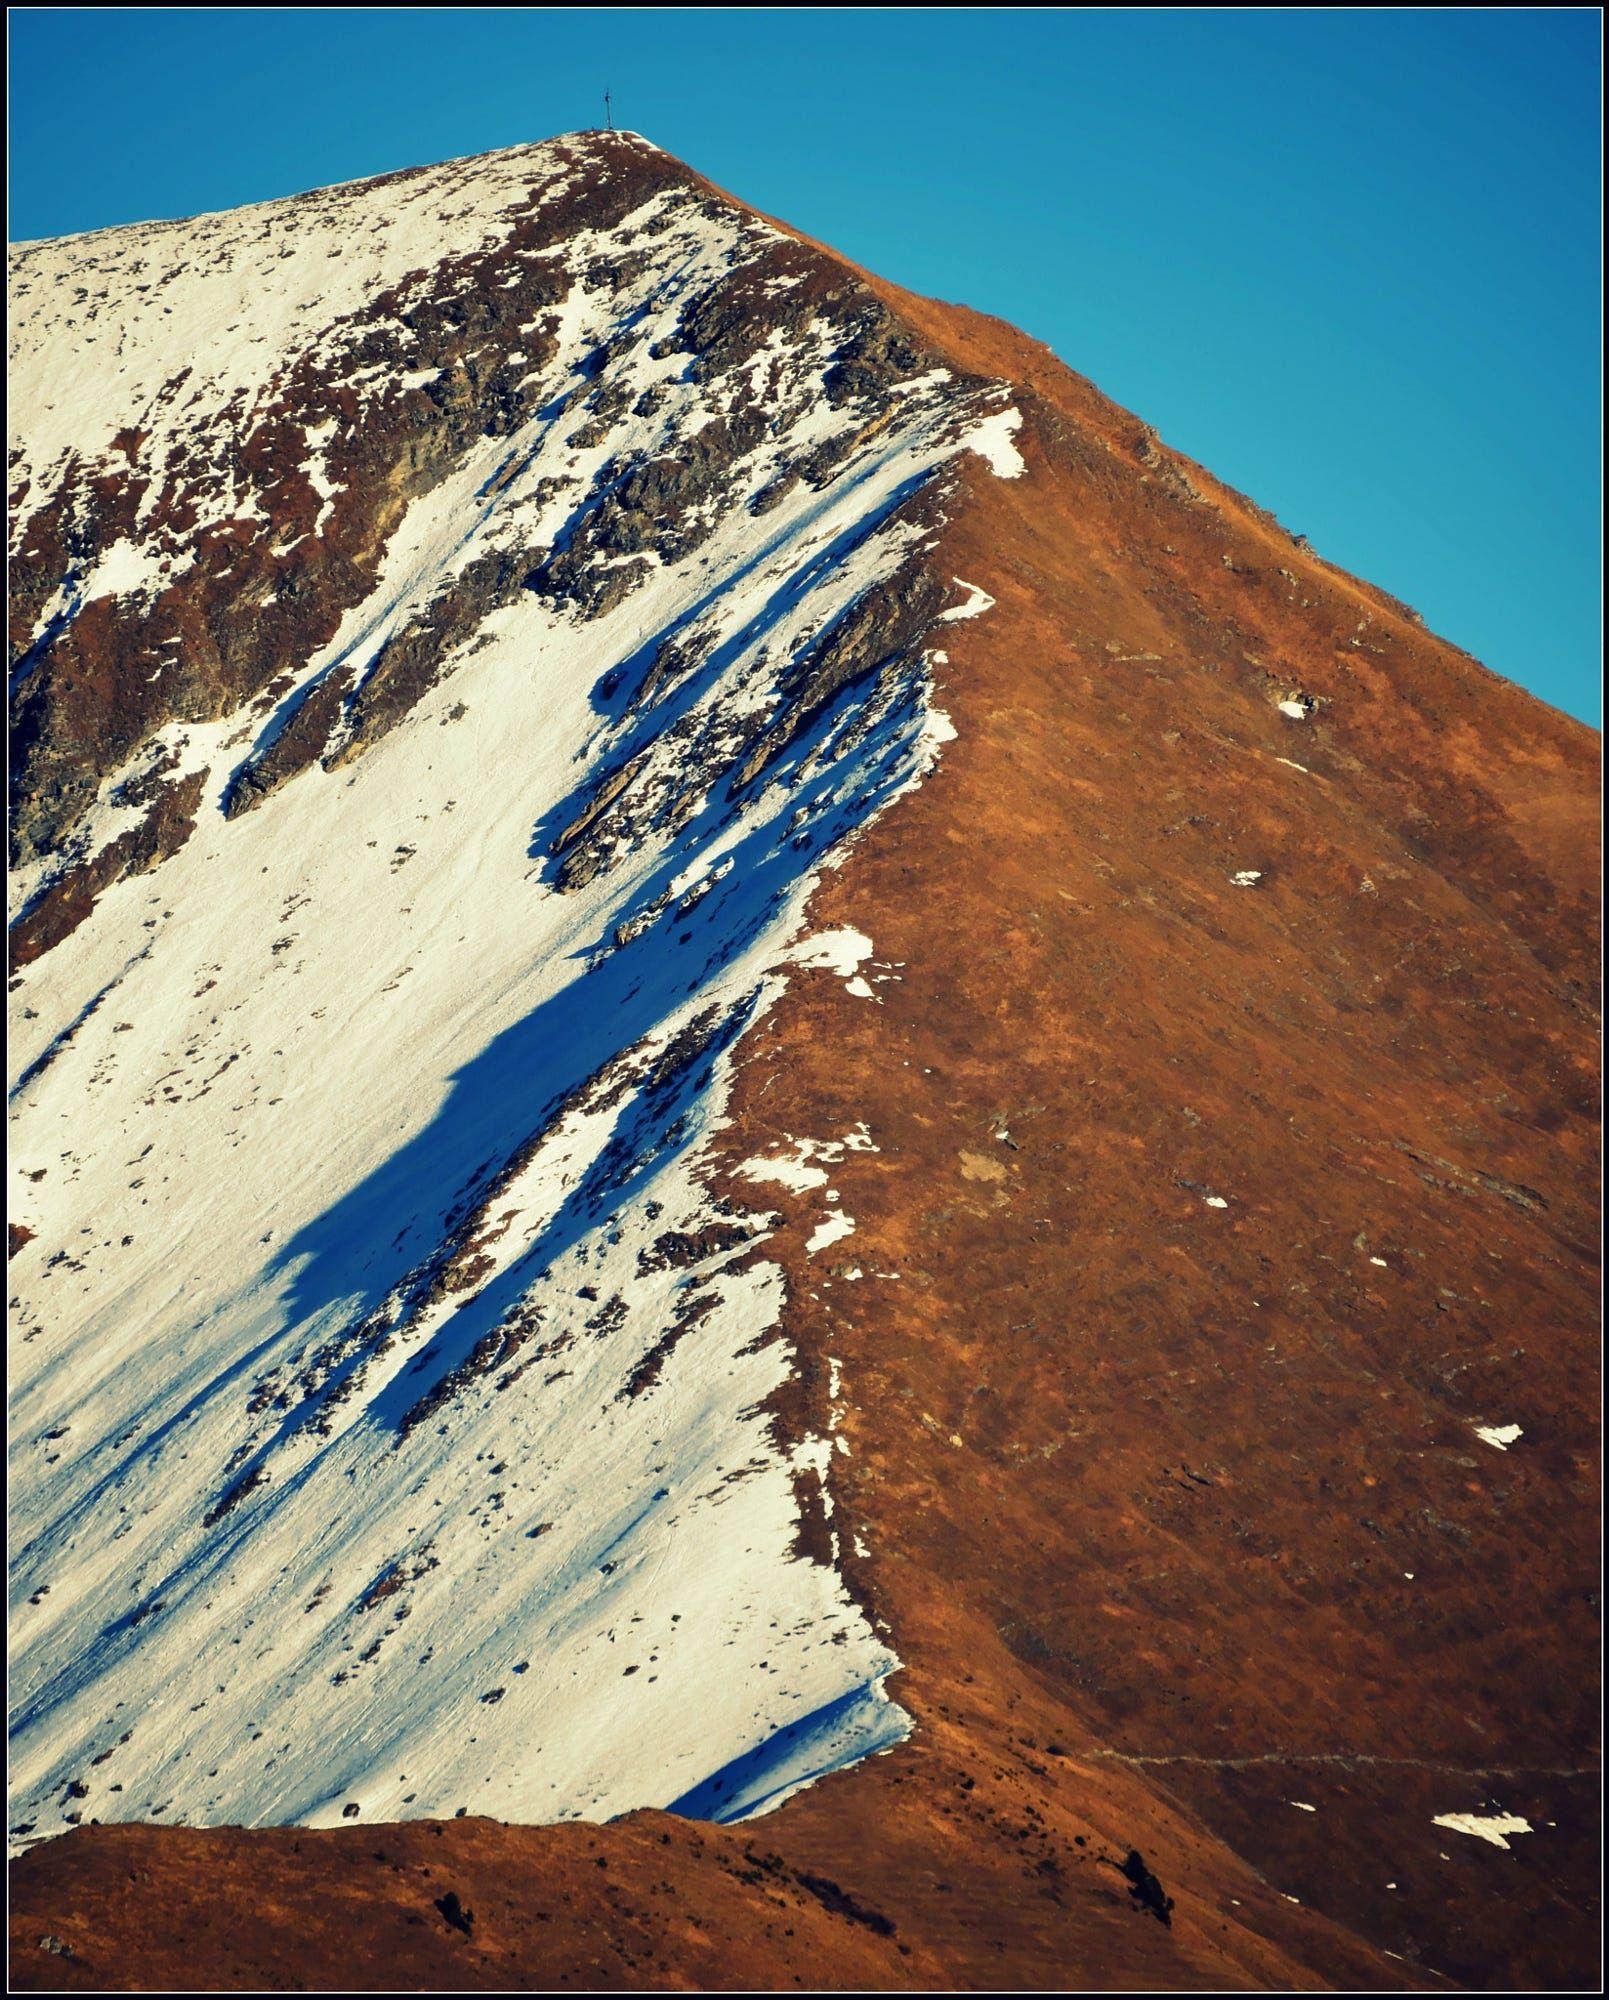 #Photography #500px Nordhang / Südhang by ernstkramer https://t.co/AVwhcWk3mV #IFTTT #Nature #HappyHolidays https://t.co/0Klbs0LLtX #foll #photography